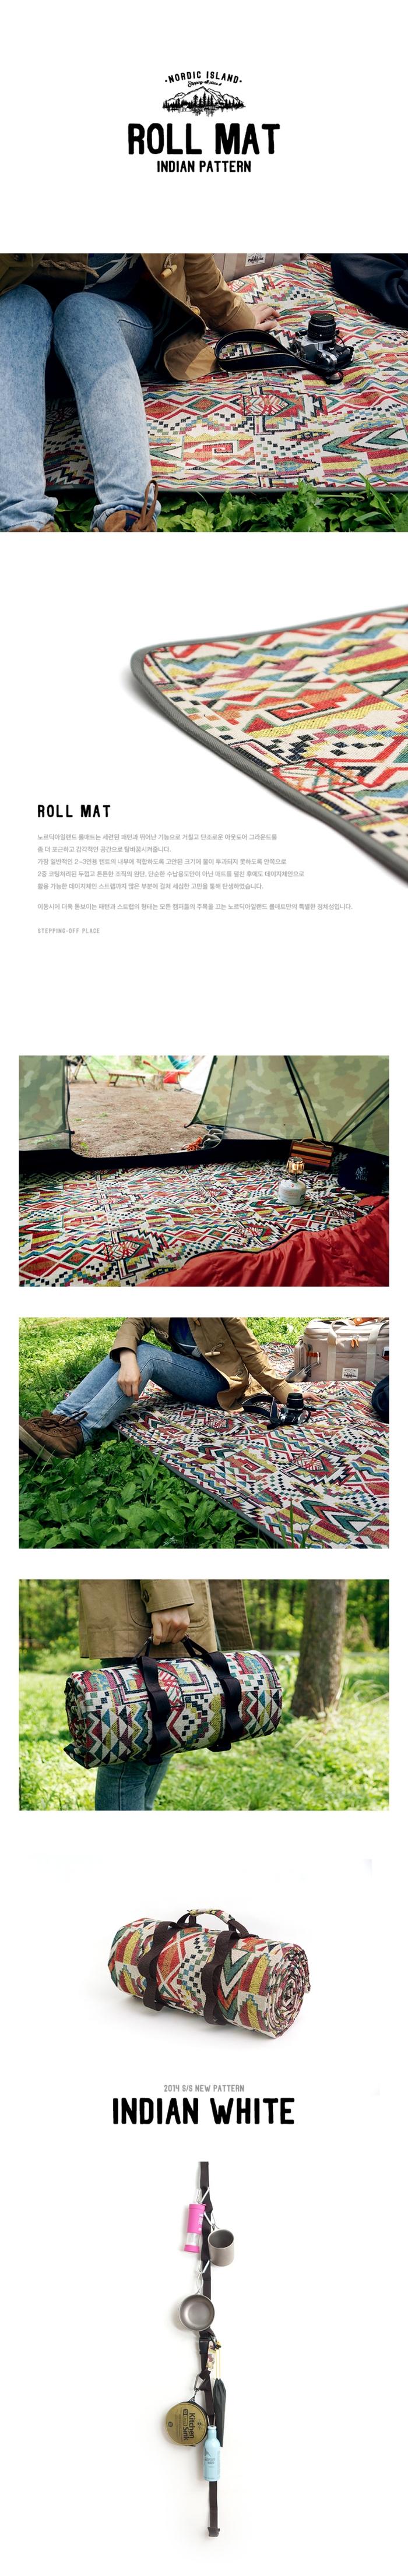 (複製)NORDIC ISLAND | Roll mat防水野餐墊 (Stripe Green)